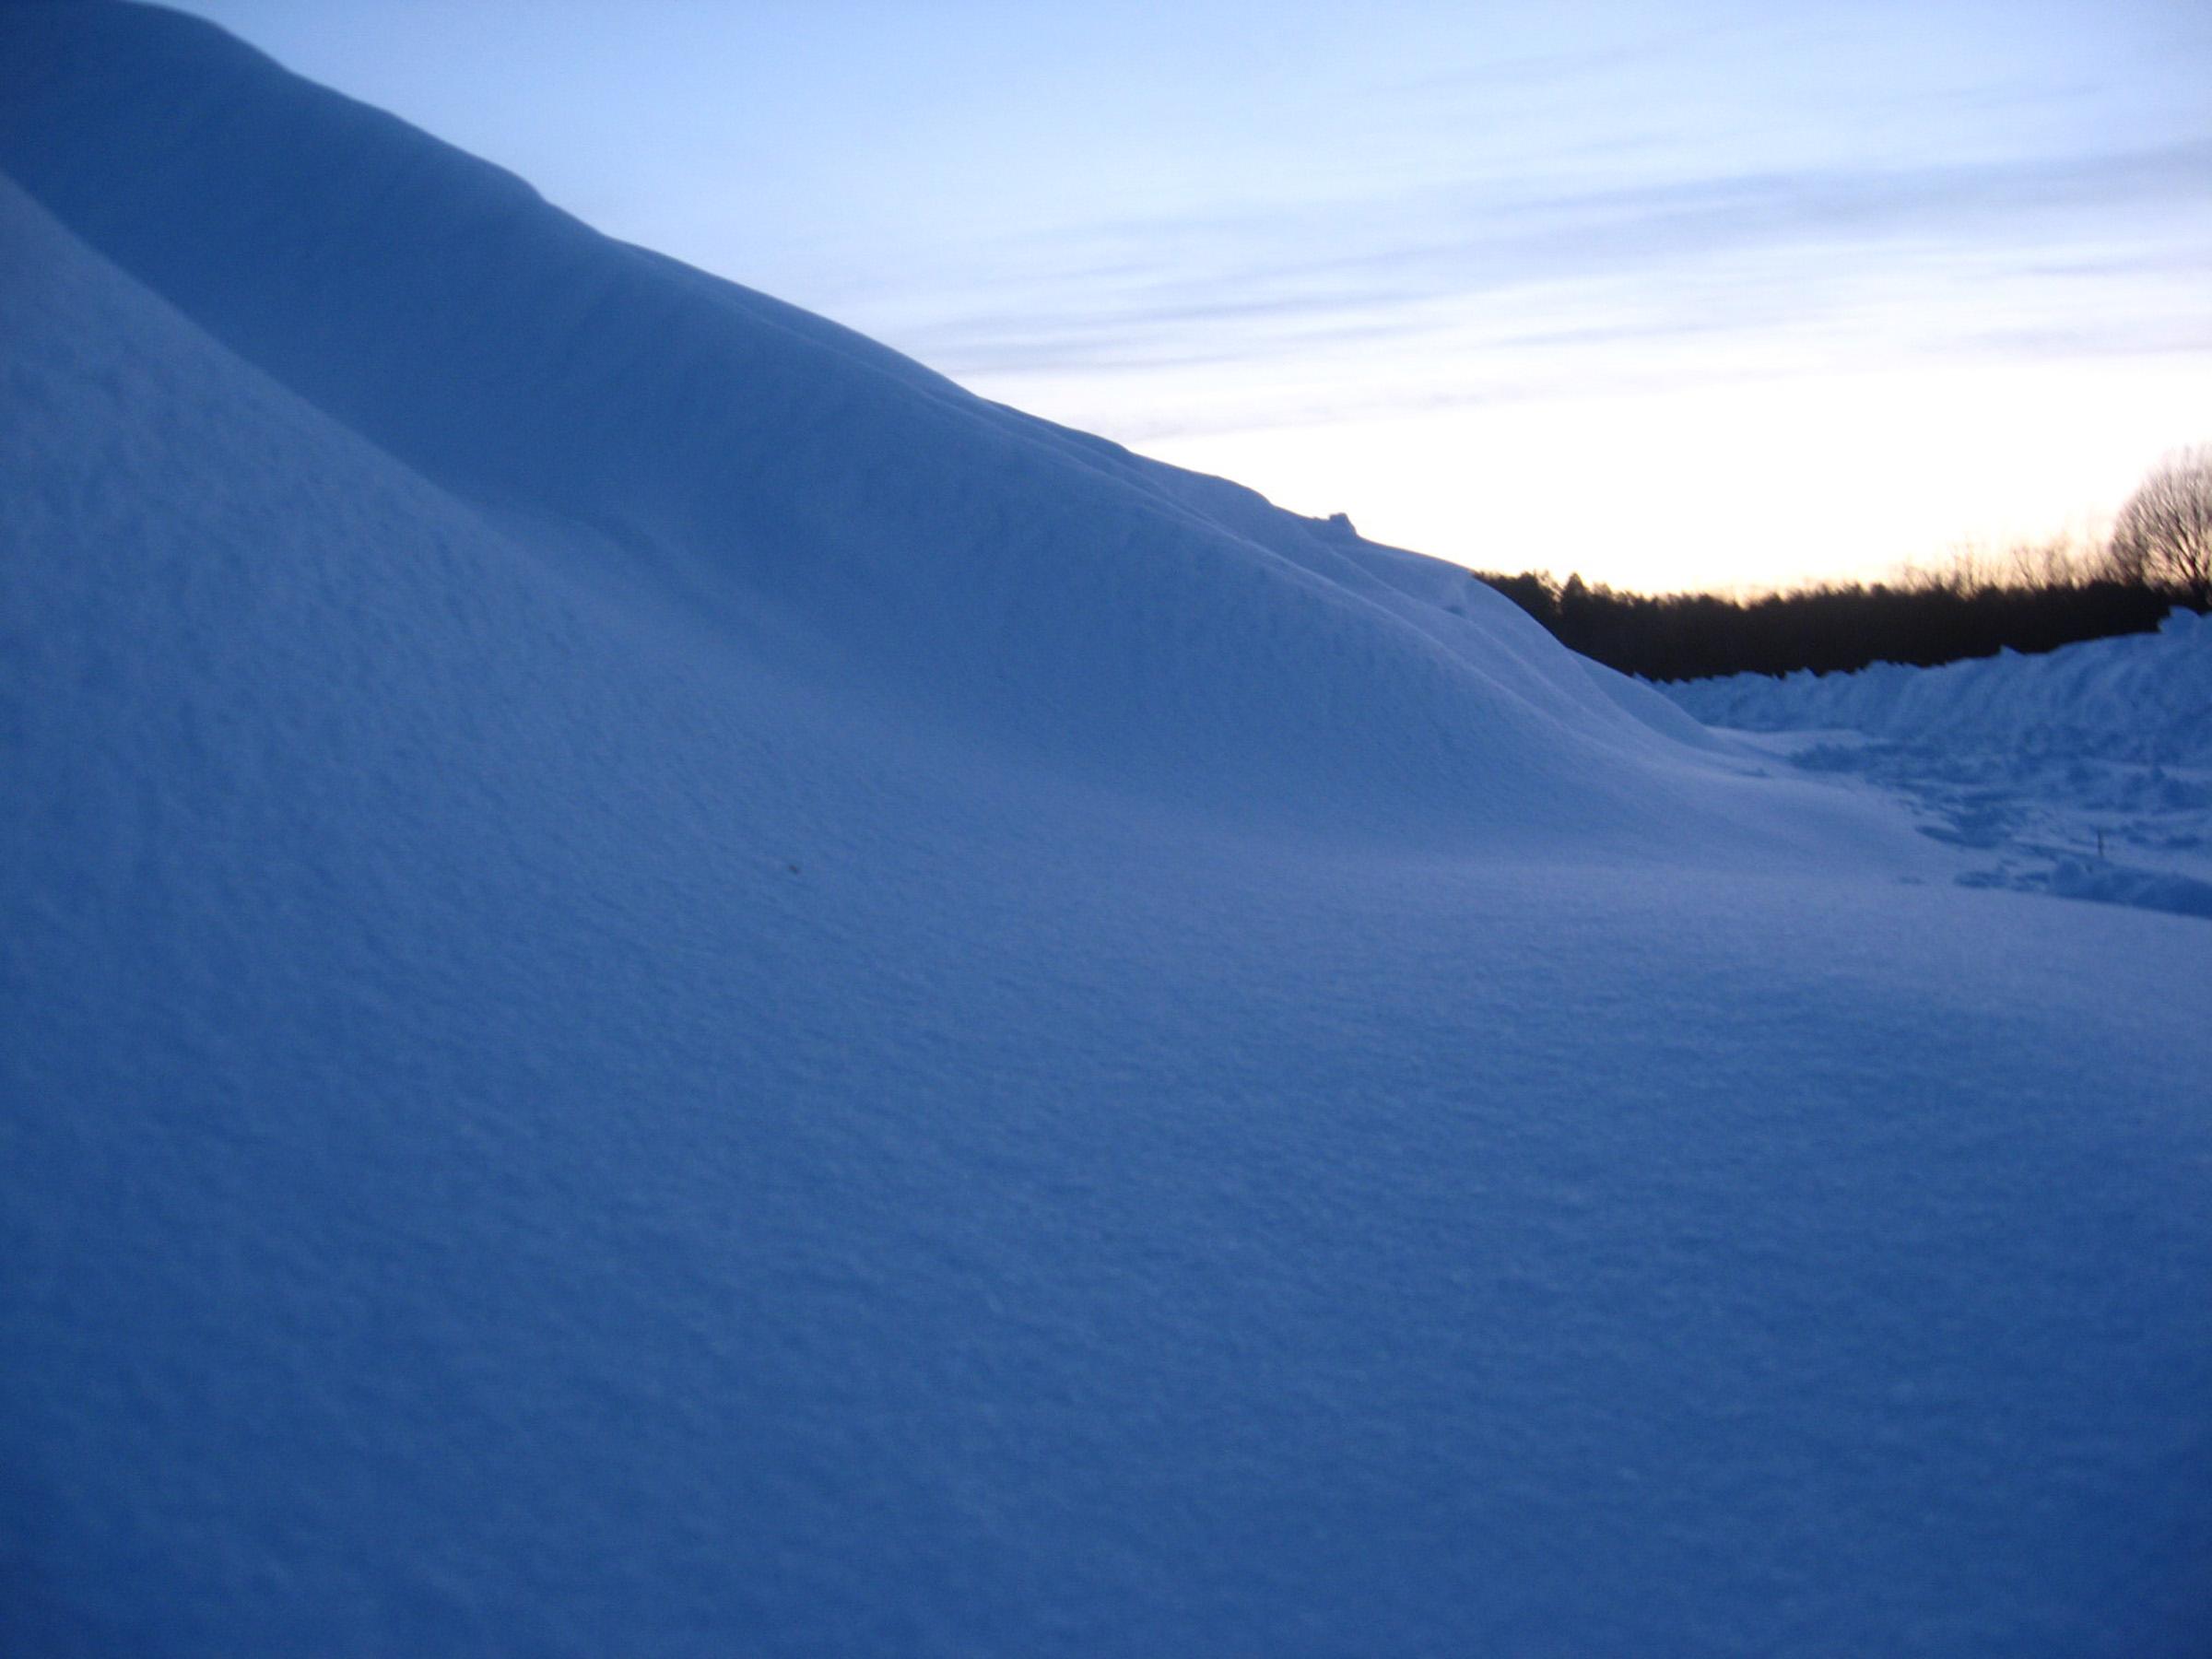 Blue snow, Blue, Cold, Hill, Seasonal, HQ Photo